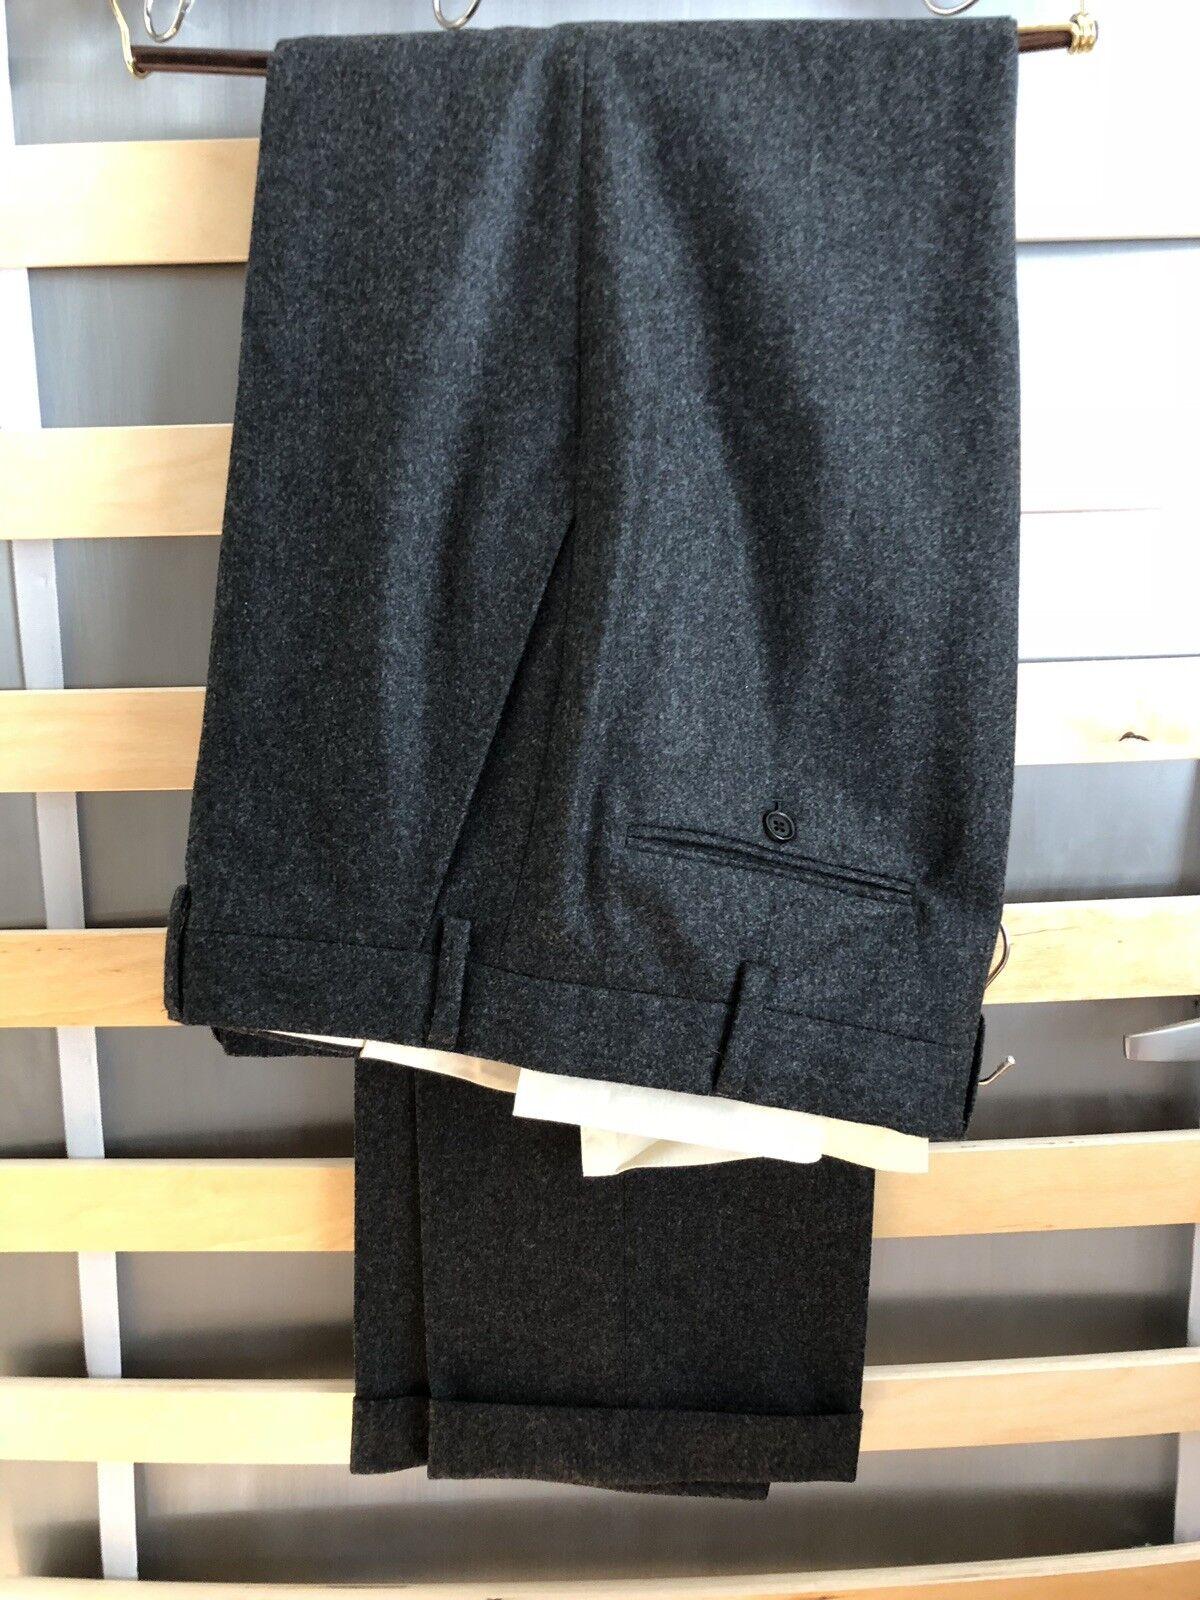 Ralph Lauren Purple Label — Charcoal Flannel Trousers — Flat Front — Size 35